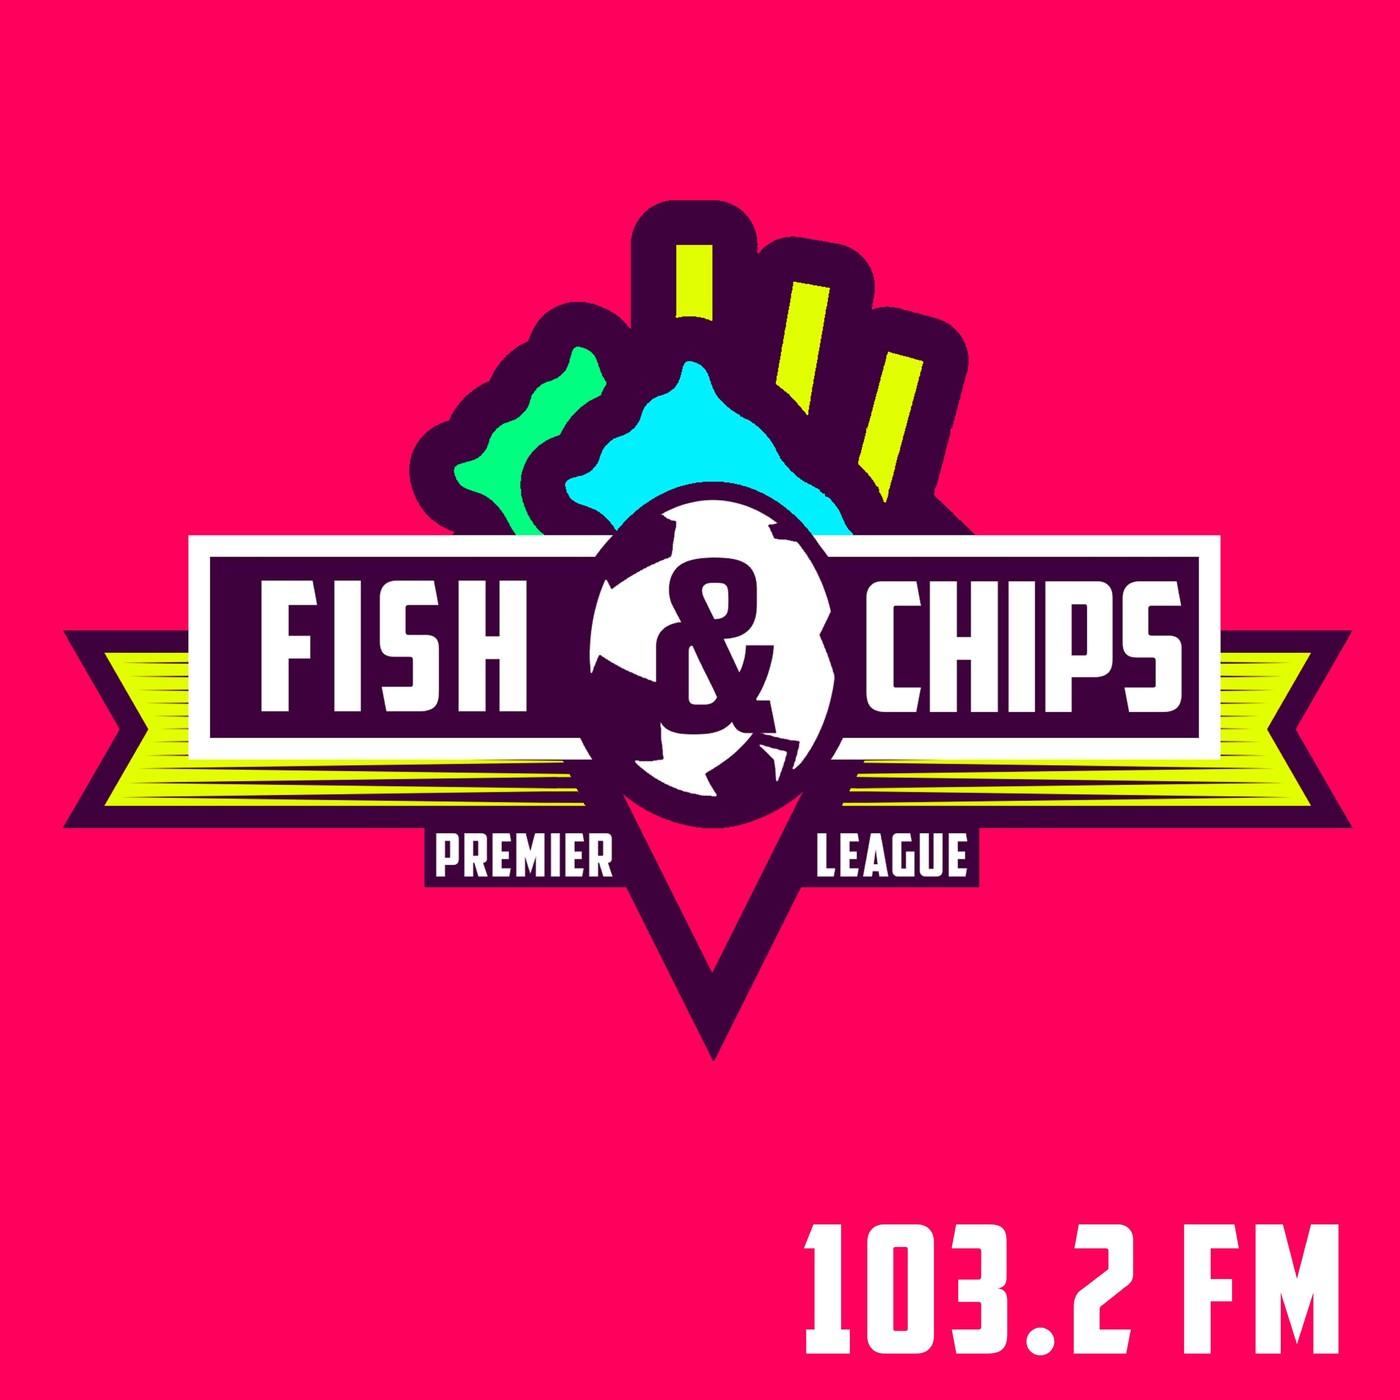 Fish & Chips 21.09.2017